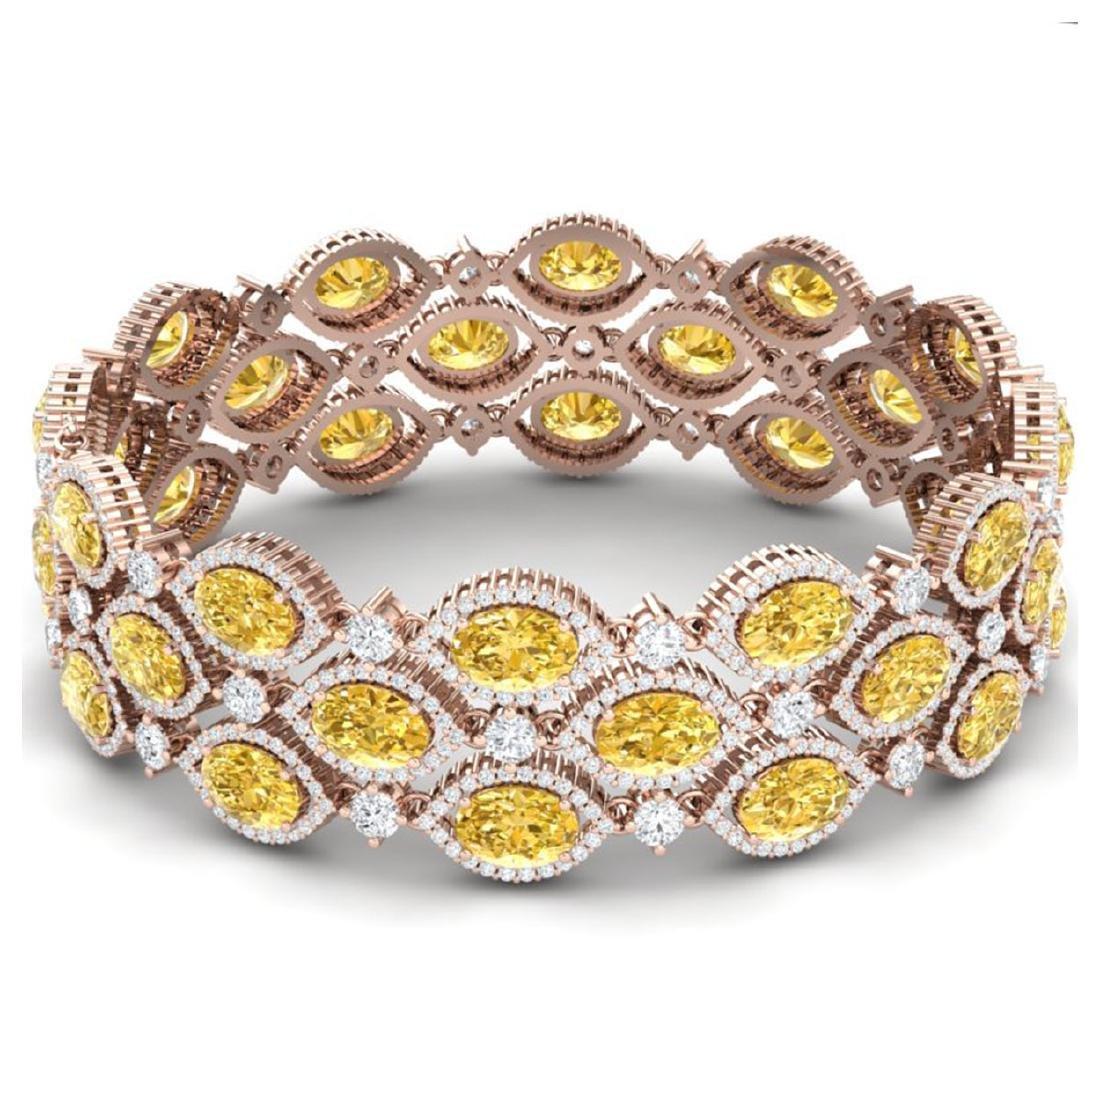 43.84 ctw Canary Citrine & VS Diamond Bracelet 18K Rose - 3